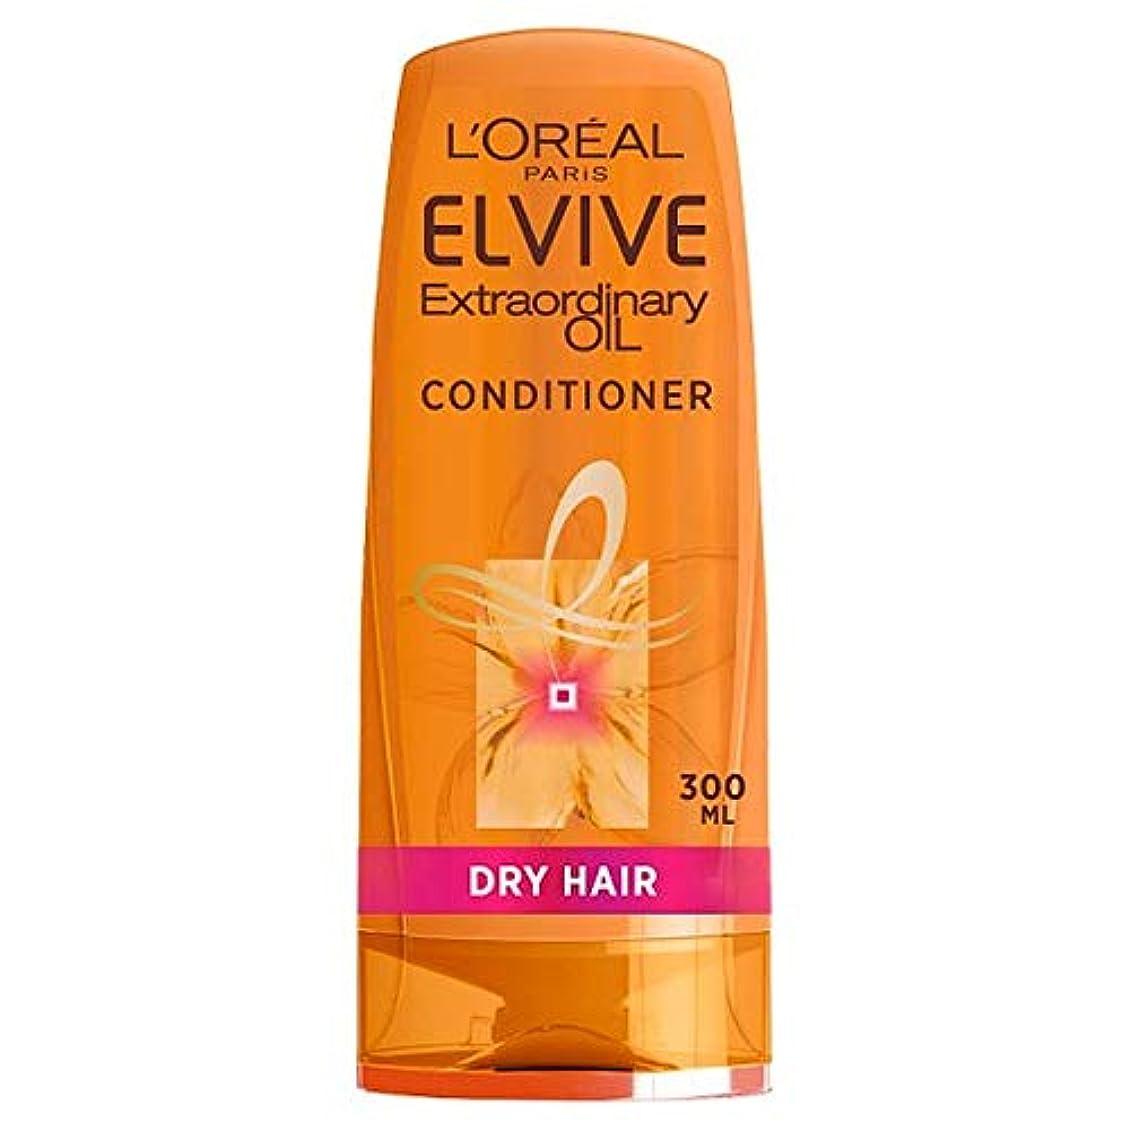 [Elvive] ロレアルElvive臨時オイルドライヘアコンディショナー300ミリリットル - L'oreal Elvive Extraordinary Oil Dry Hair Conditioner 300Ml [...